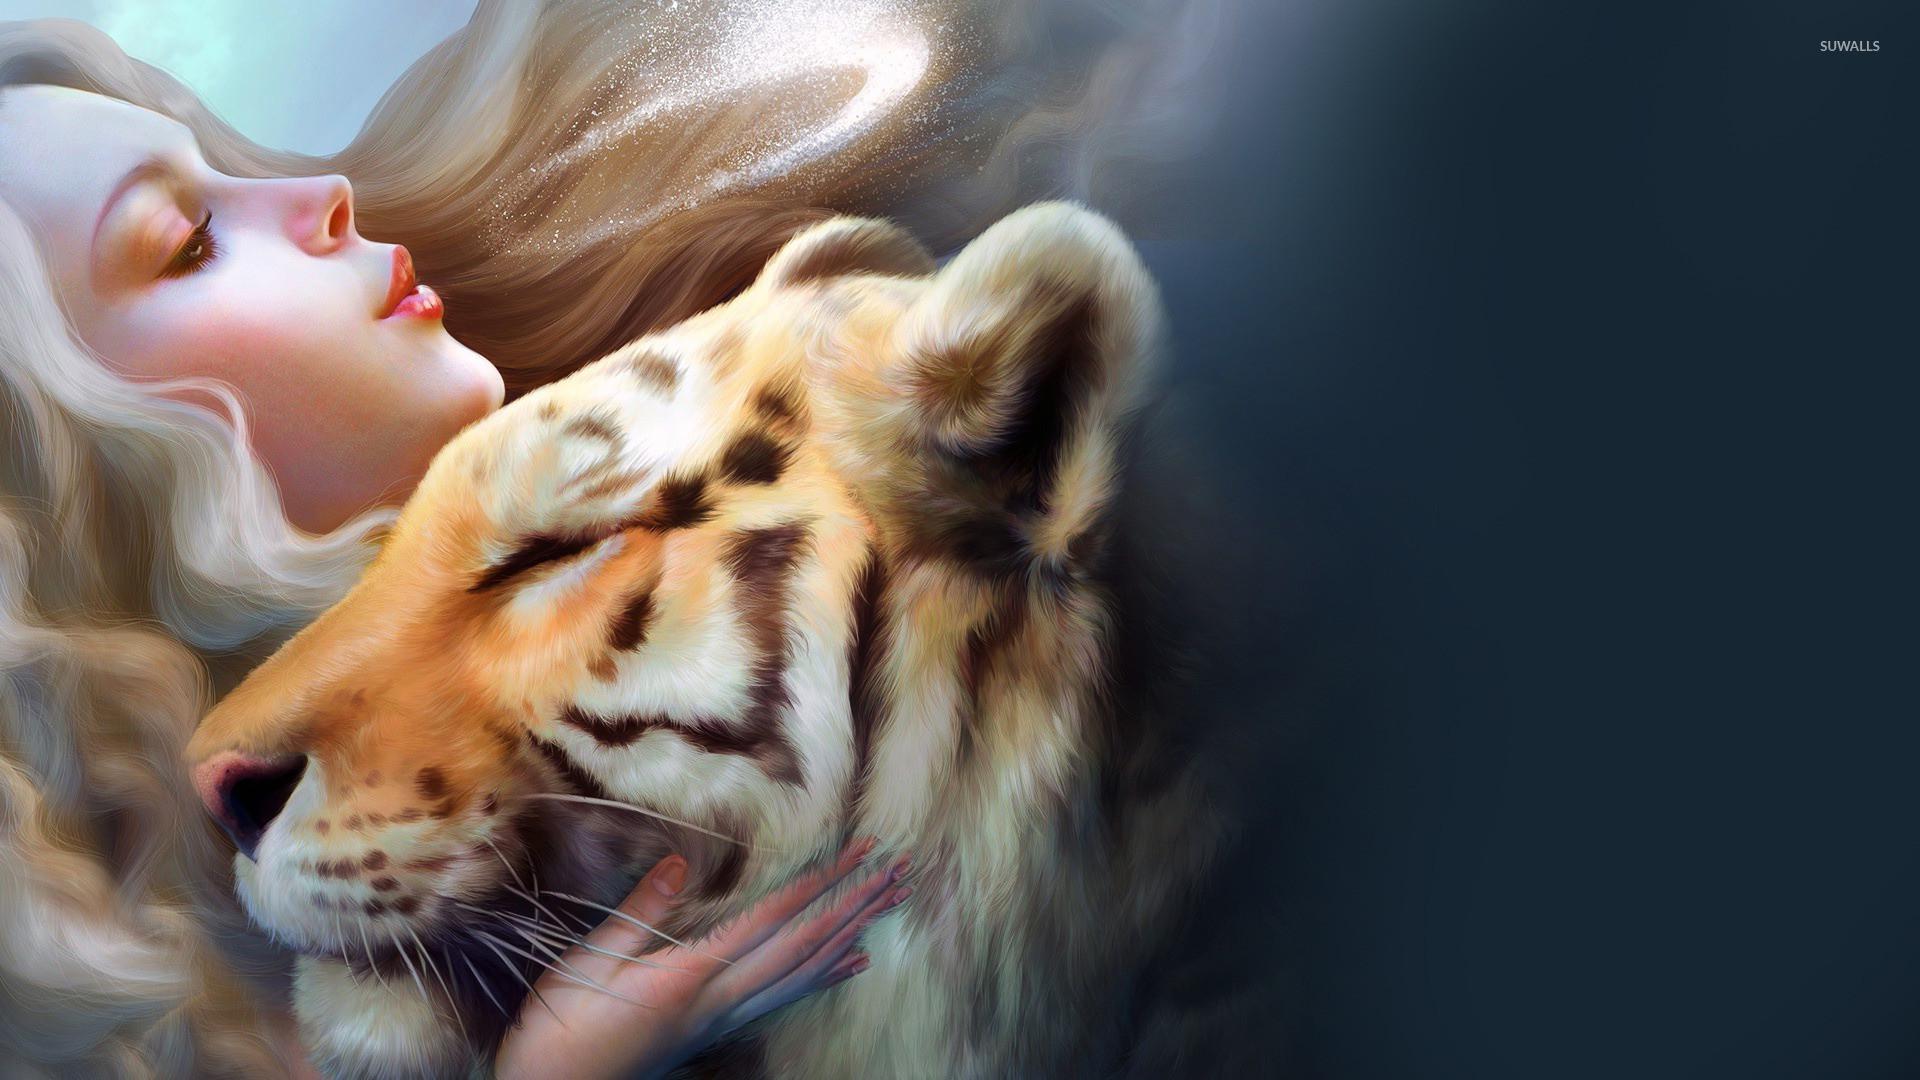 Girl with pet tiger wallpaper jpg